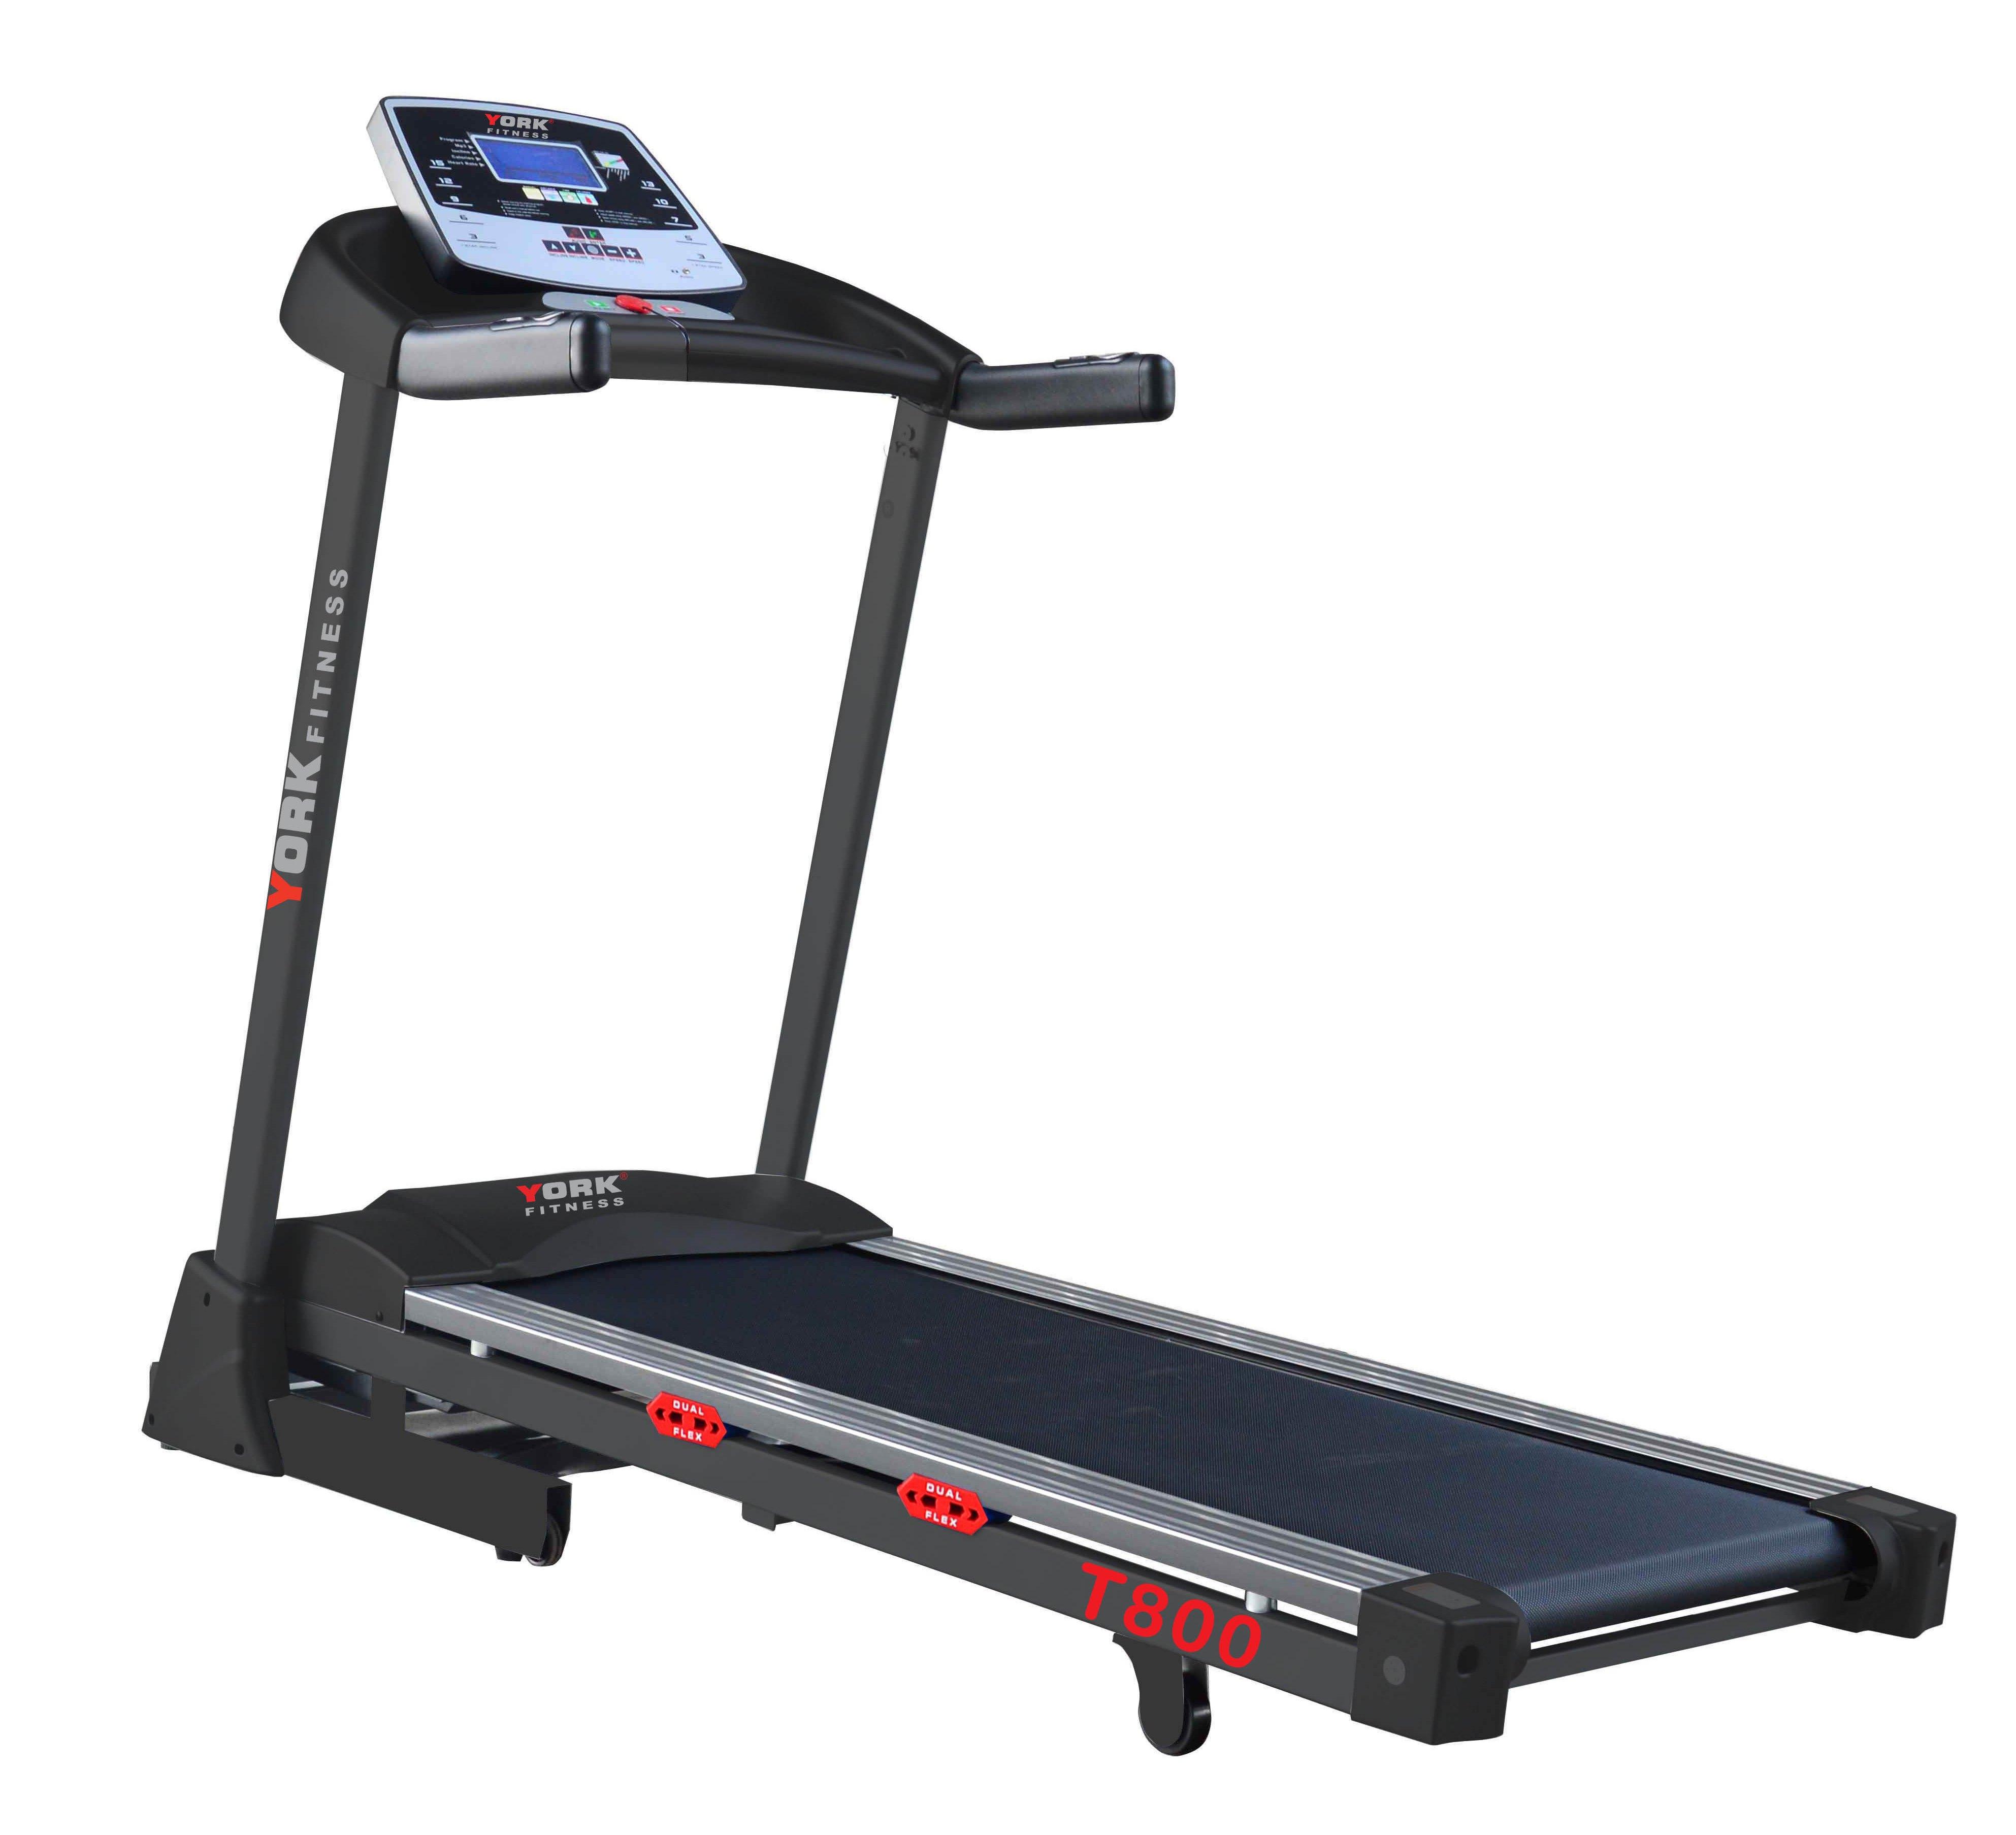 Fitness Equipment Parts: York Treadmill Spare Parts Australia